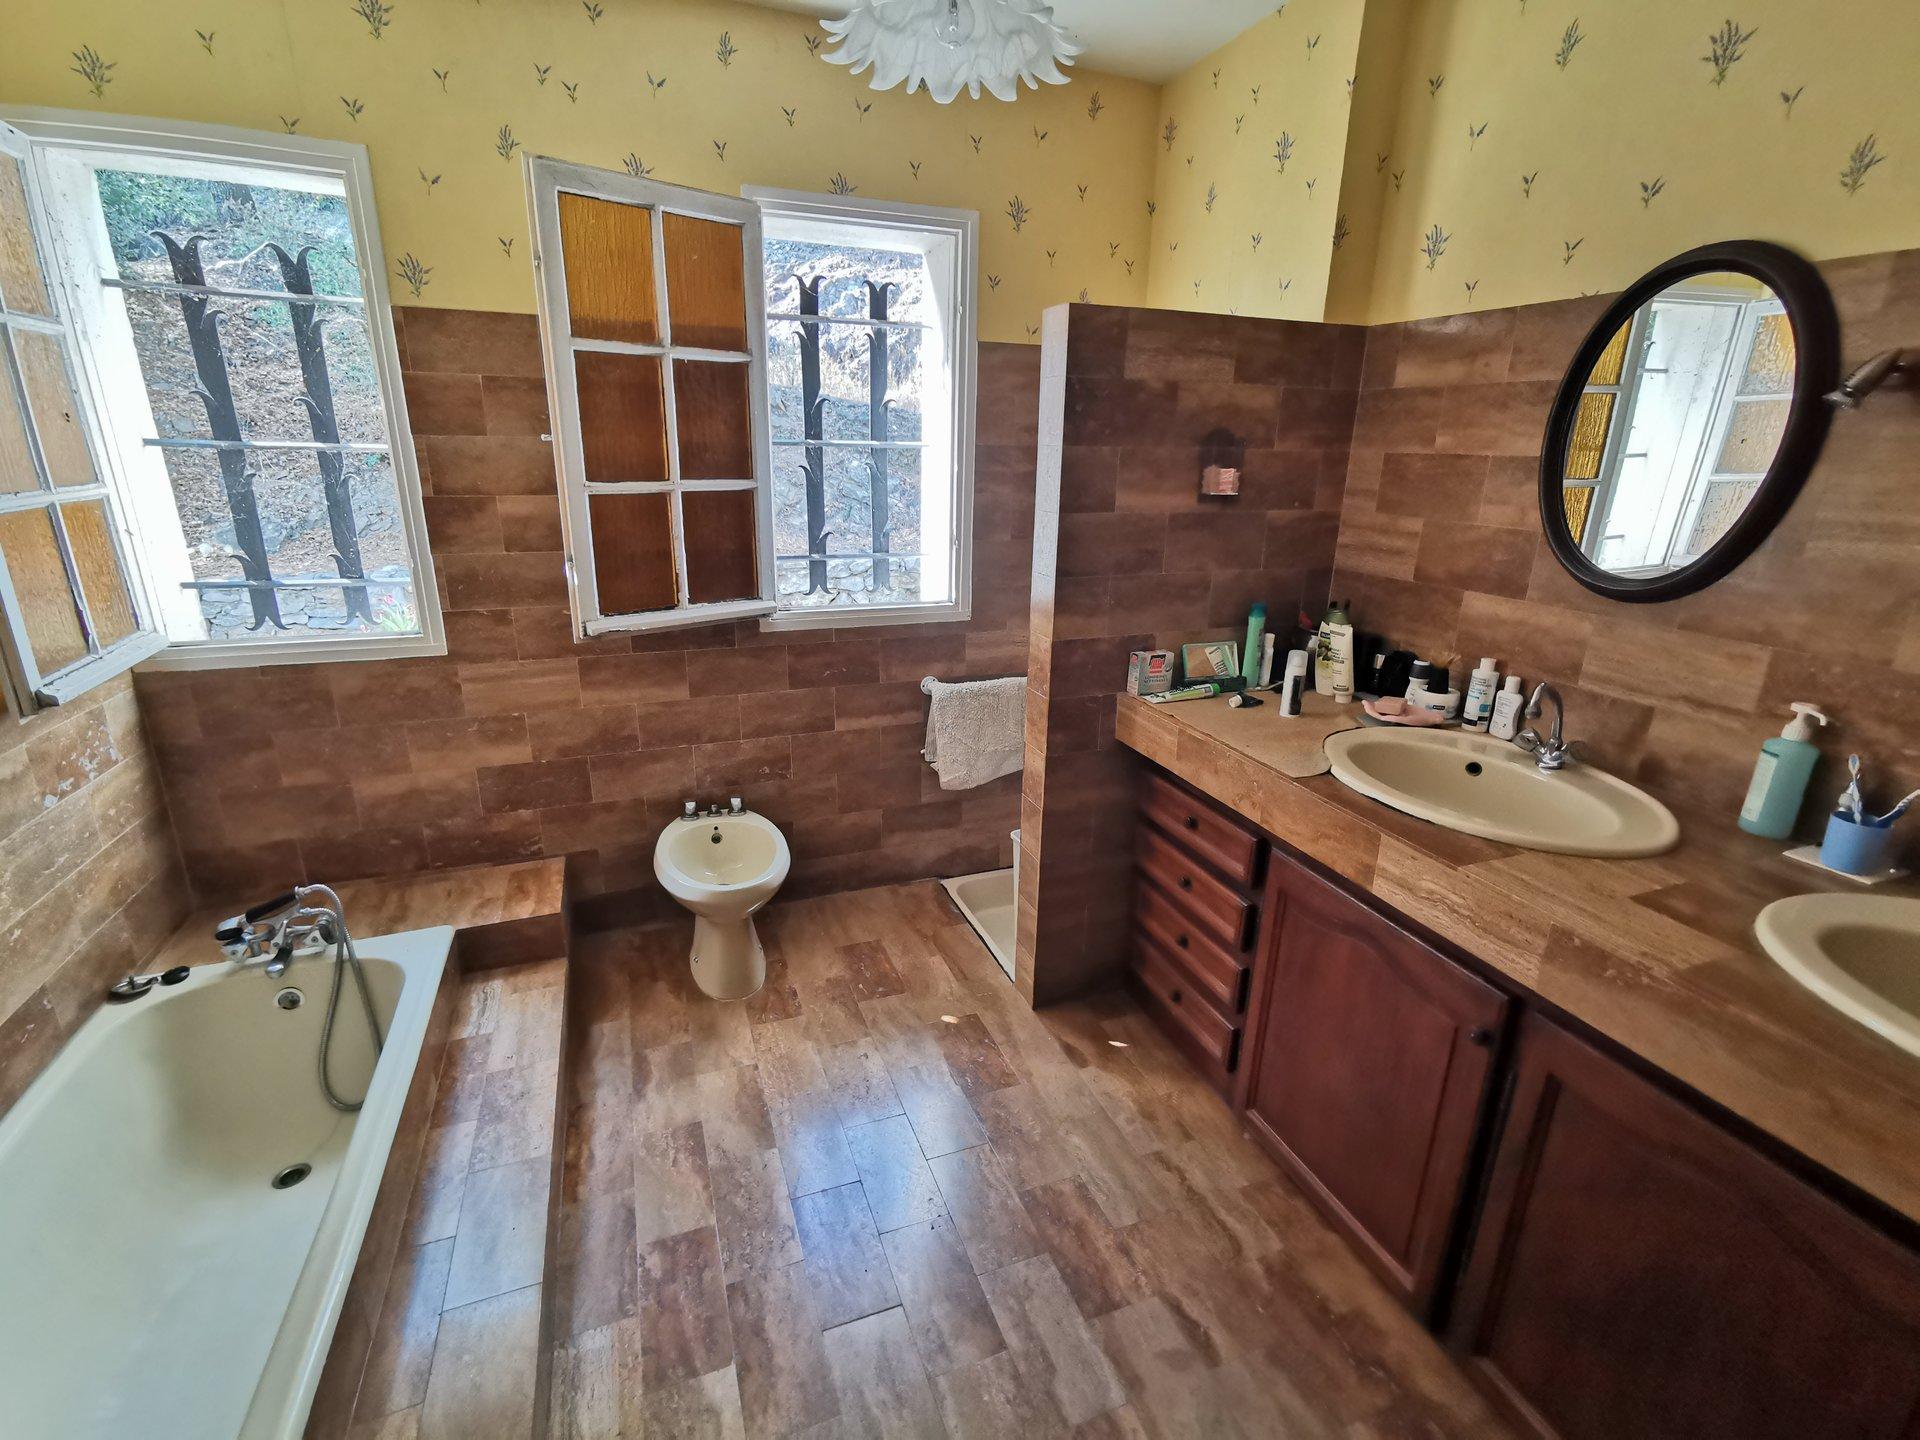 4 bedroom villa on big plot with terrific views